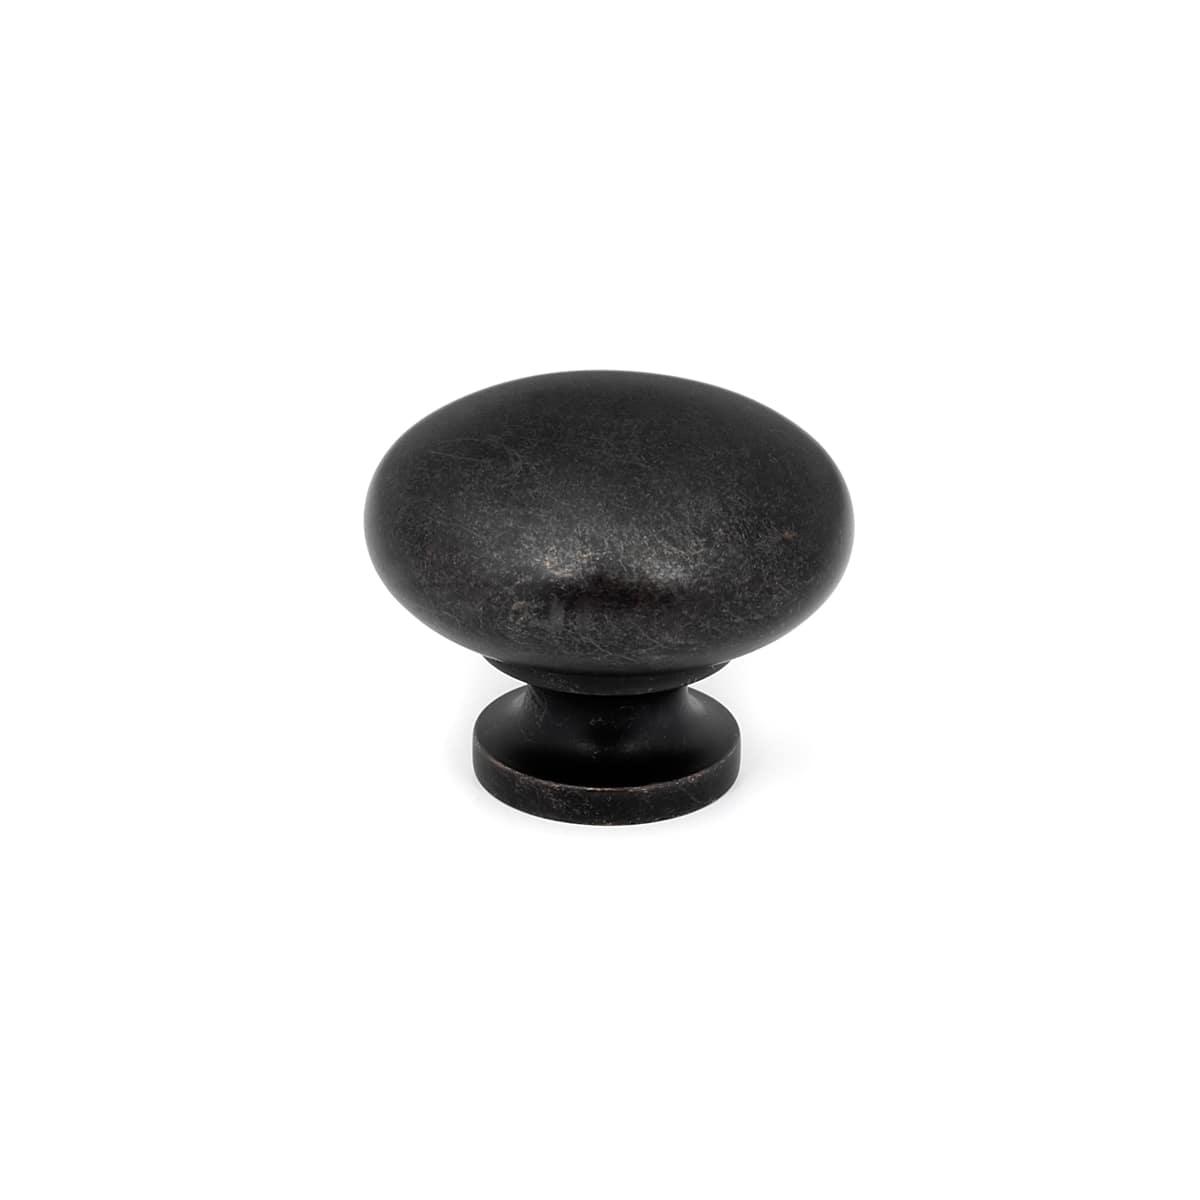 Alno Knobs 1-3/4 Inch Mushroom Cabinet Knob